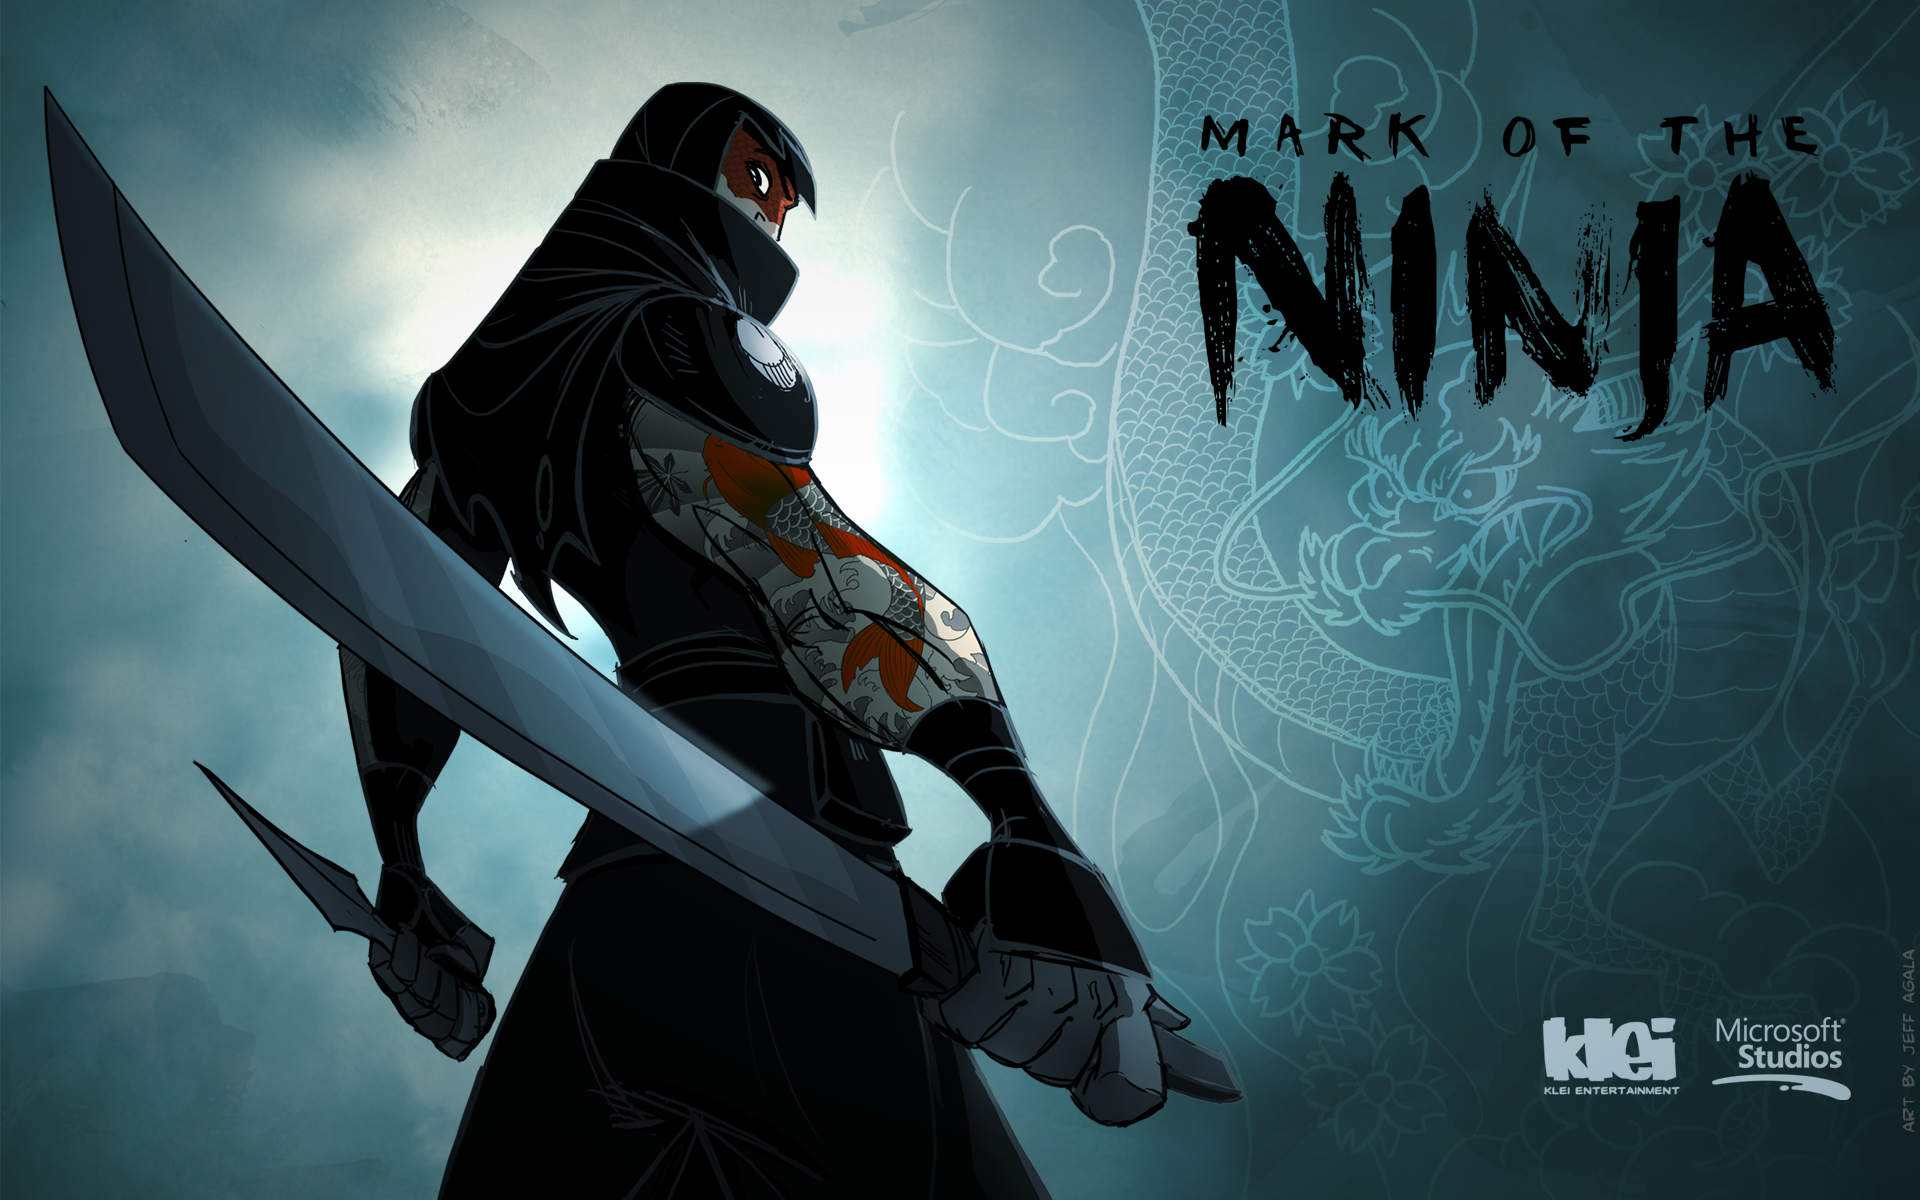 Mark of the NinjathespammockMark of the Ninja